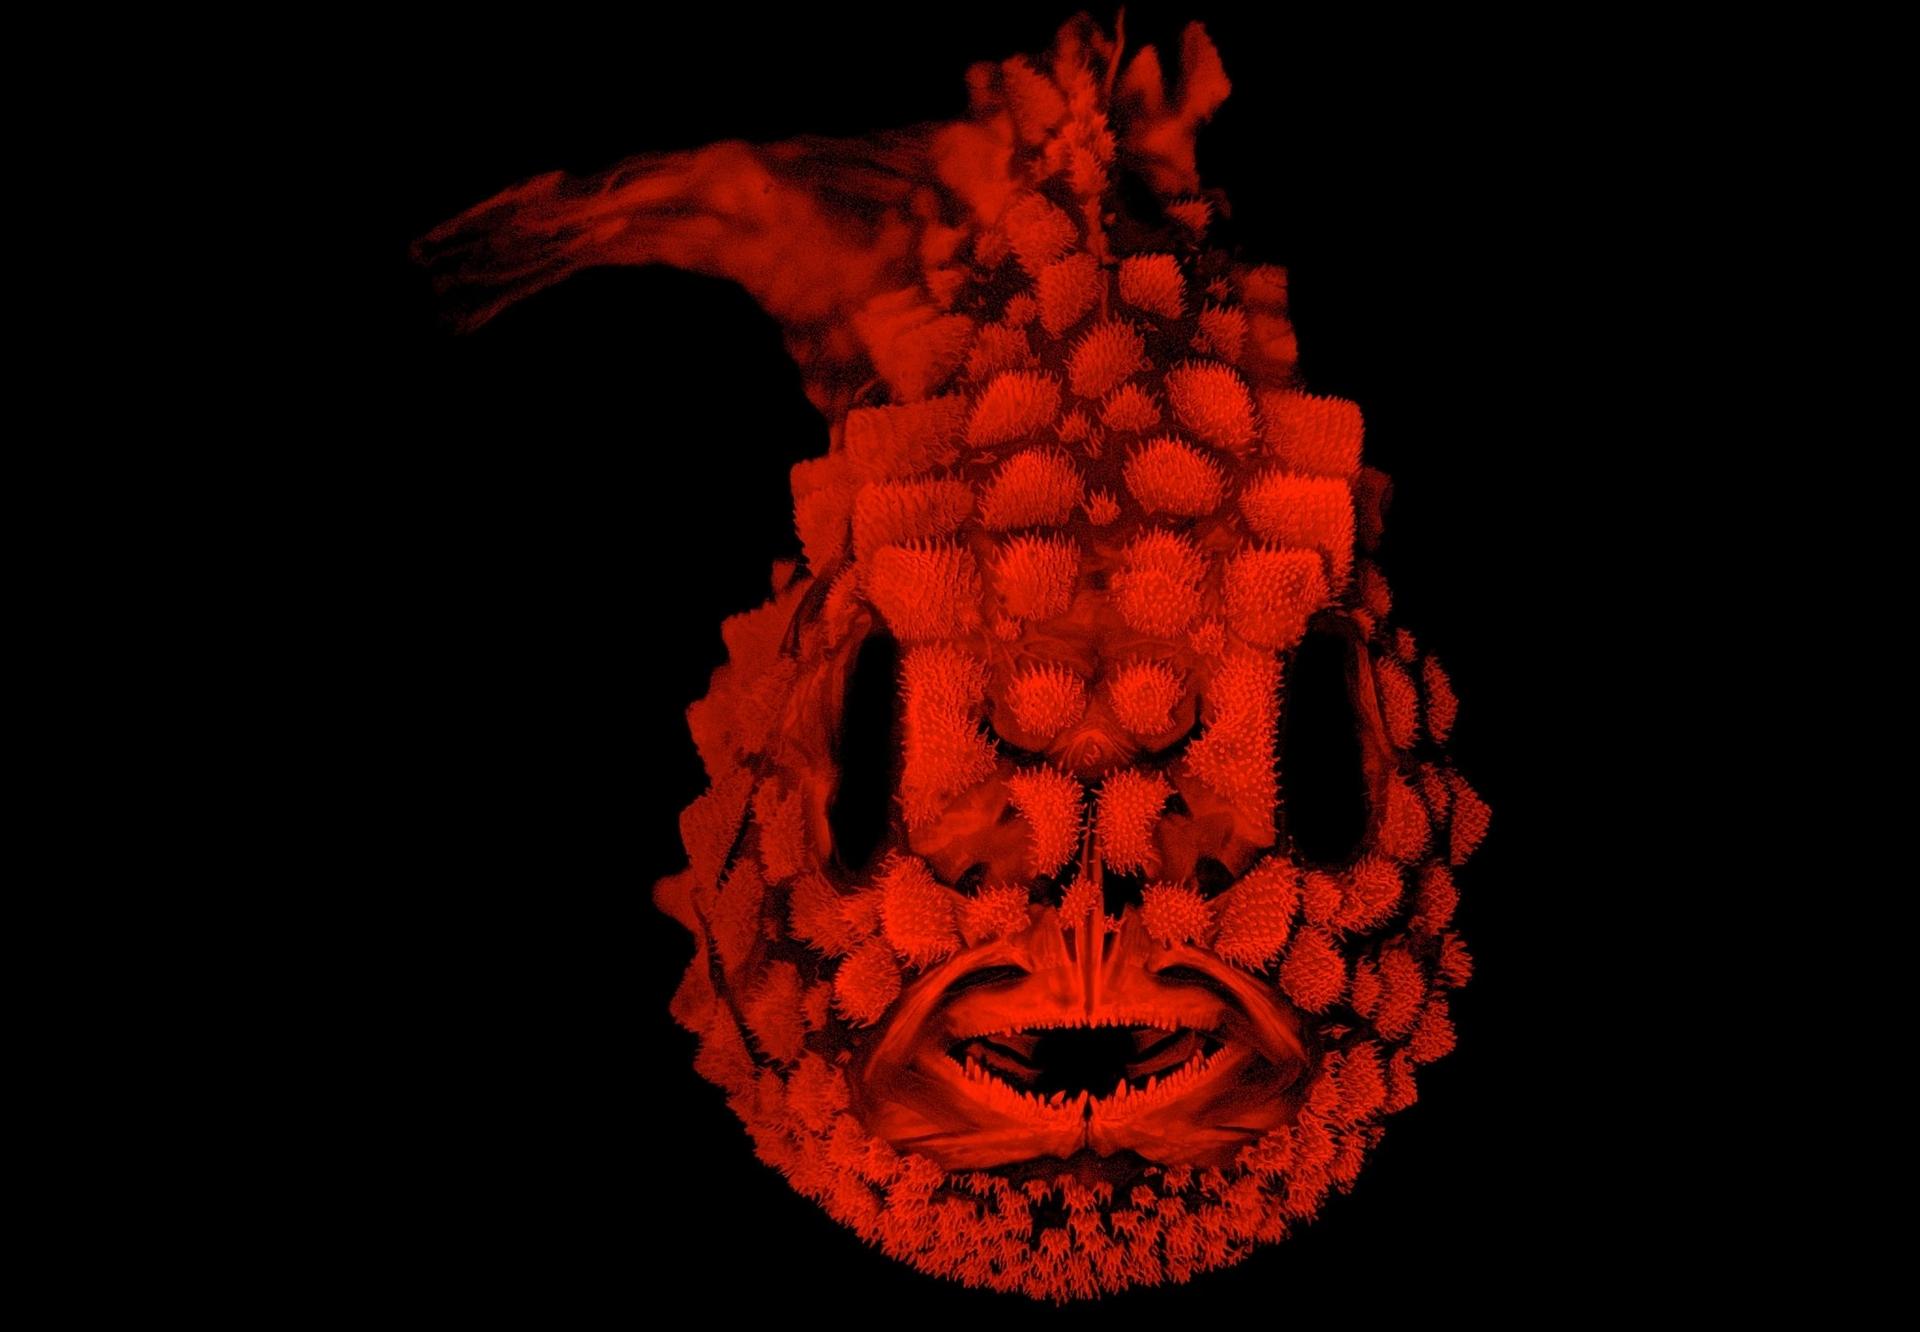 眶真圓鰭魚(Pacific spiny lumpsucker)是種大約兩公分半的小魚,全身布滿了堅硬的疣粒。PHOTOGRAPH COURTESY OF AMERICAN SOCIETY OF ICHTHYOLOGISTS AND HERPETOLOGISTS